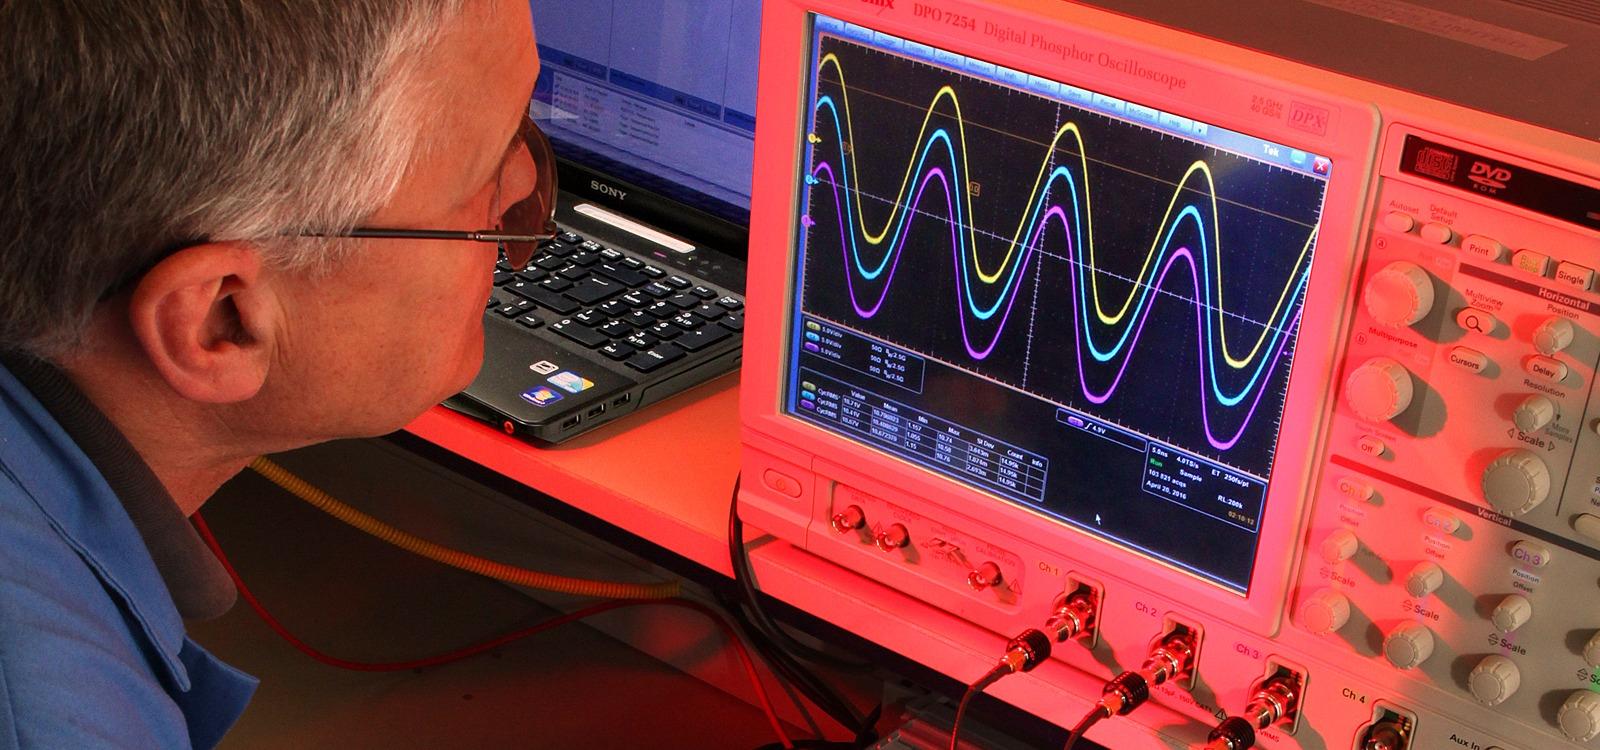 Interconics PCB Test and Analysis